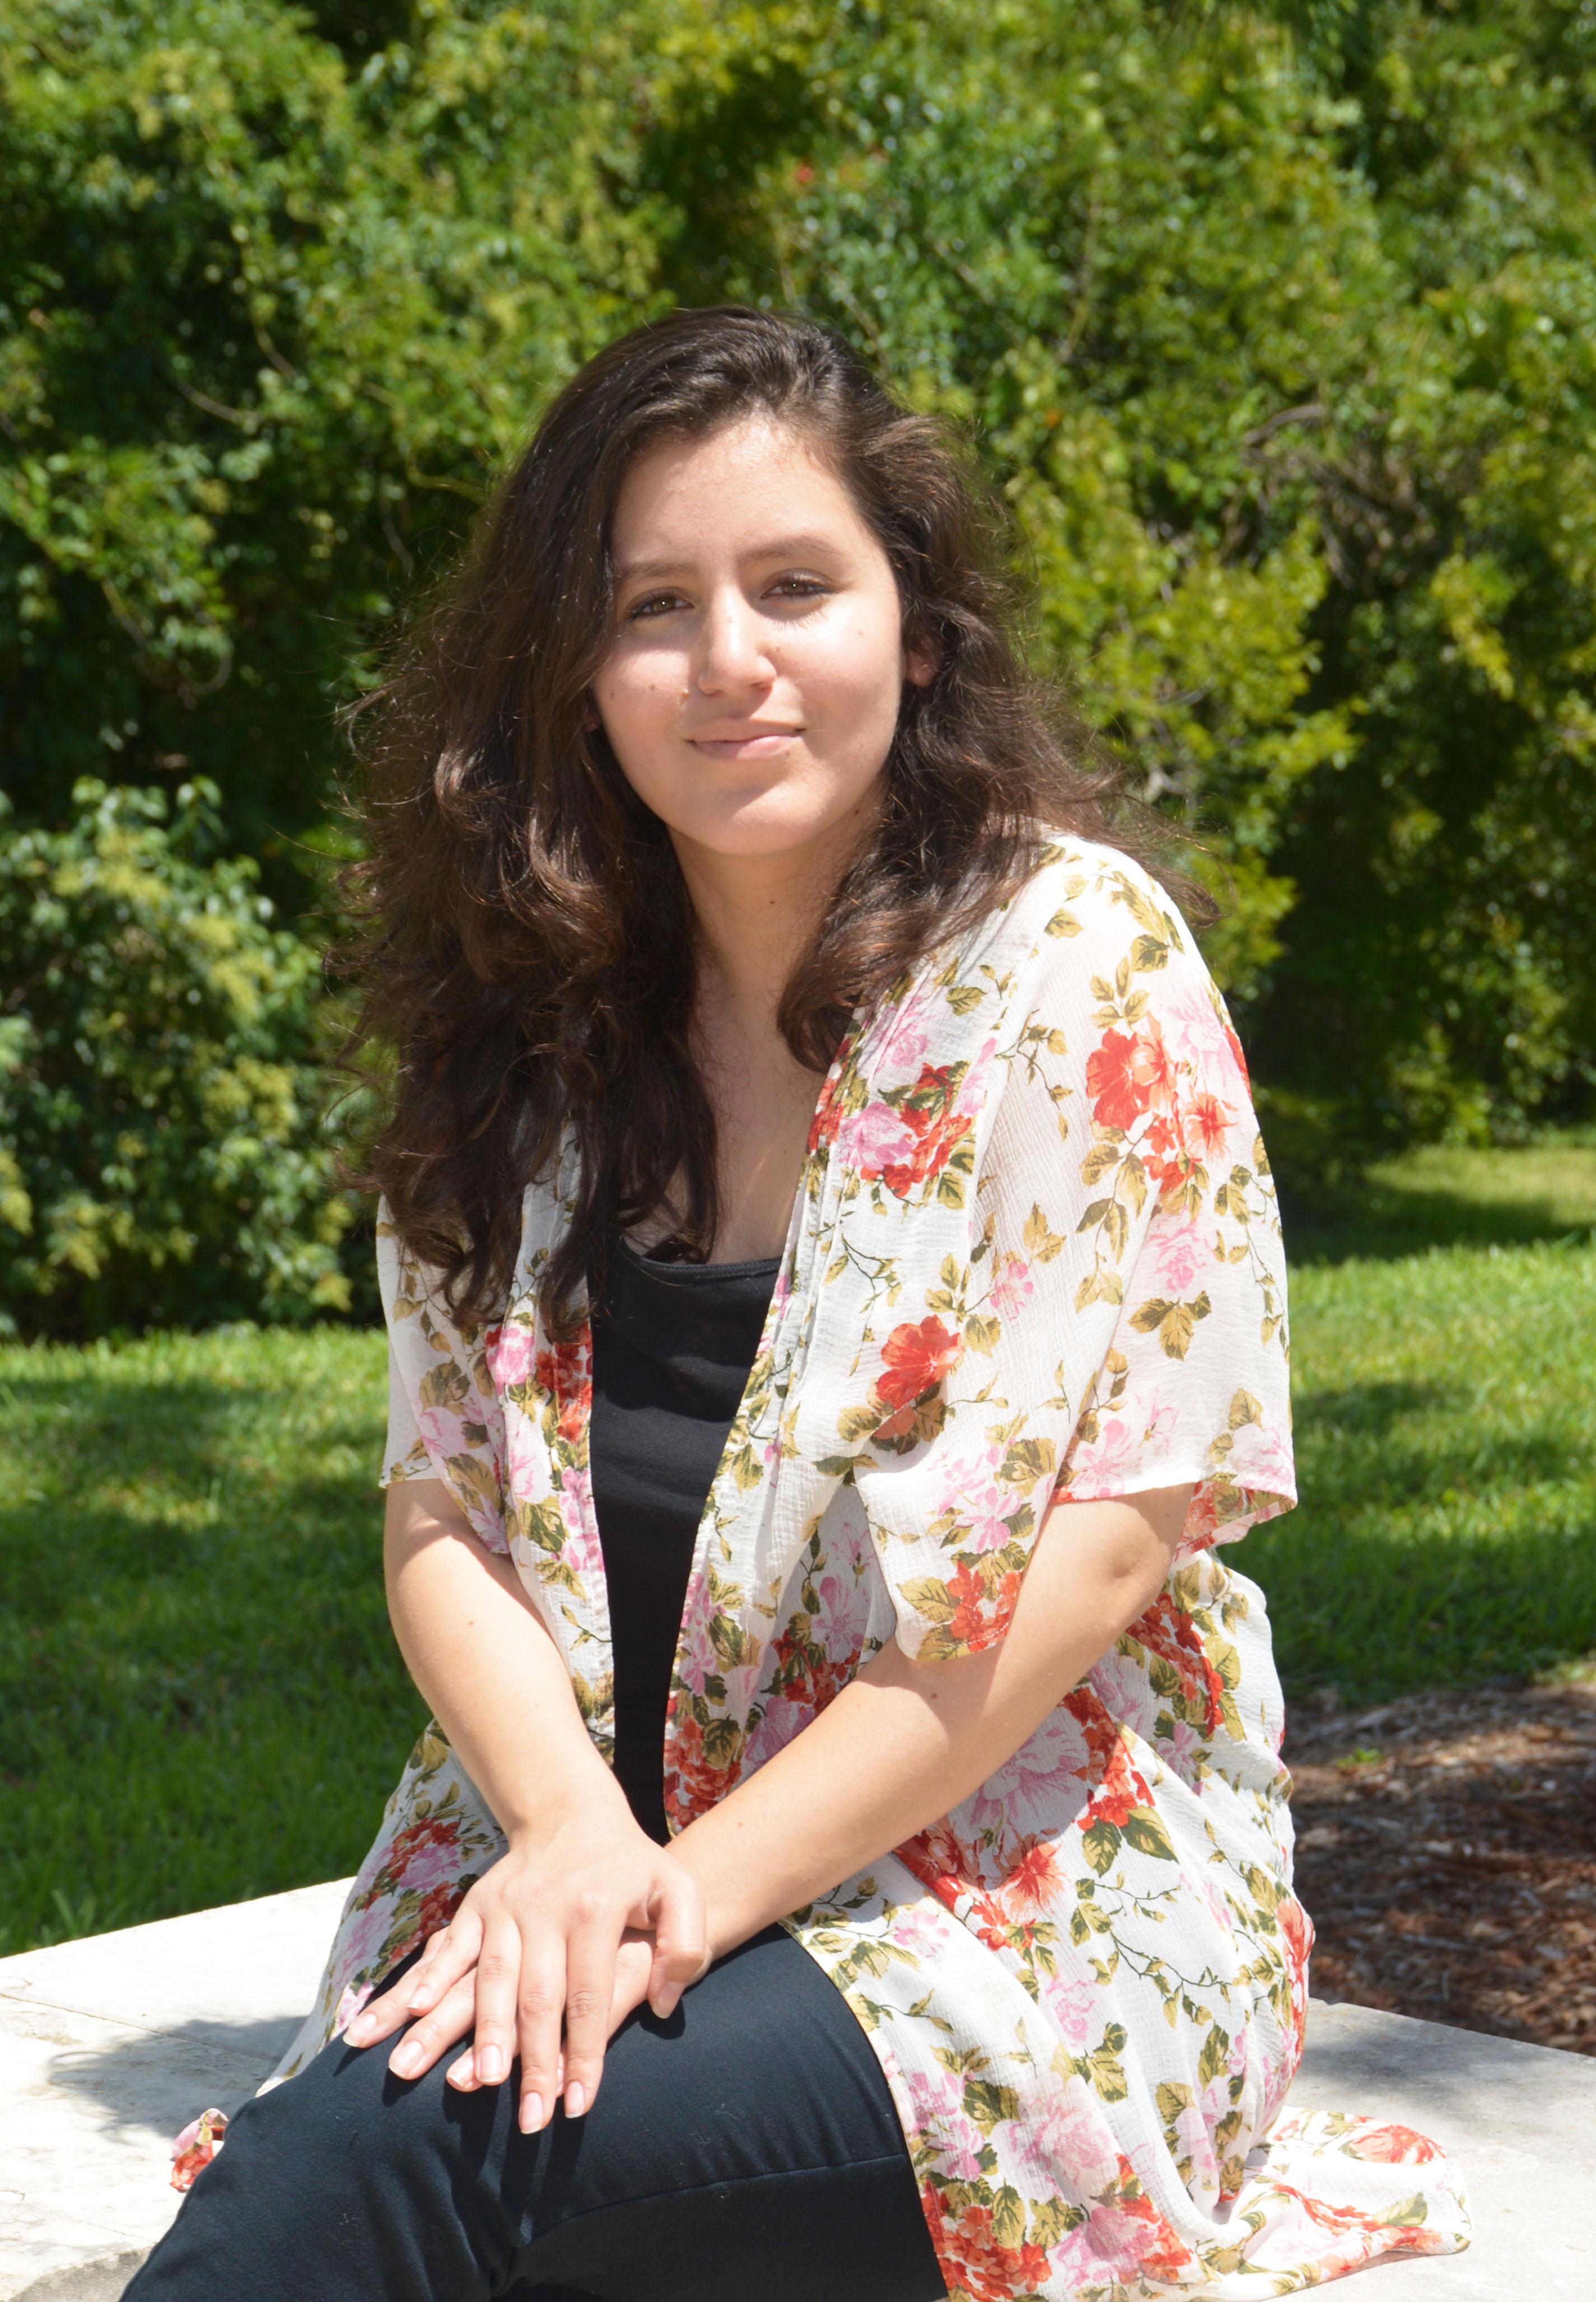 Raghda Aboulatta